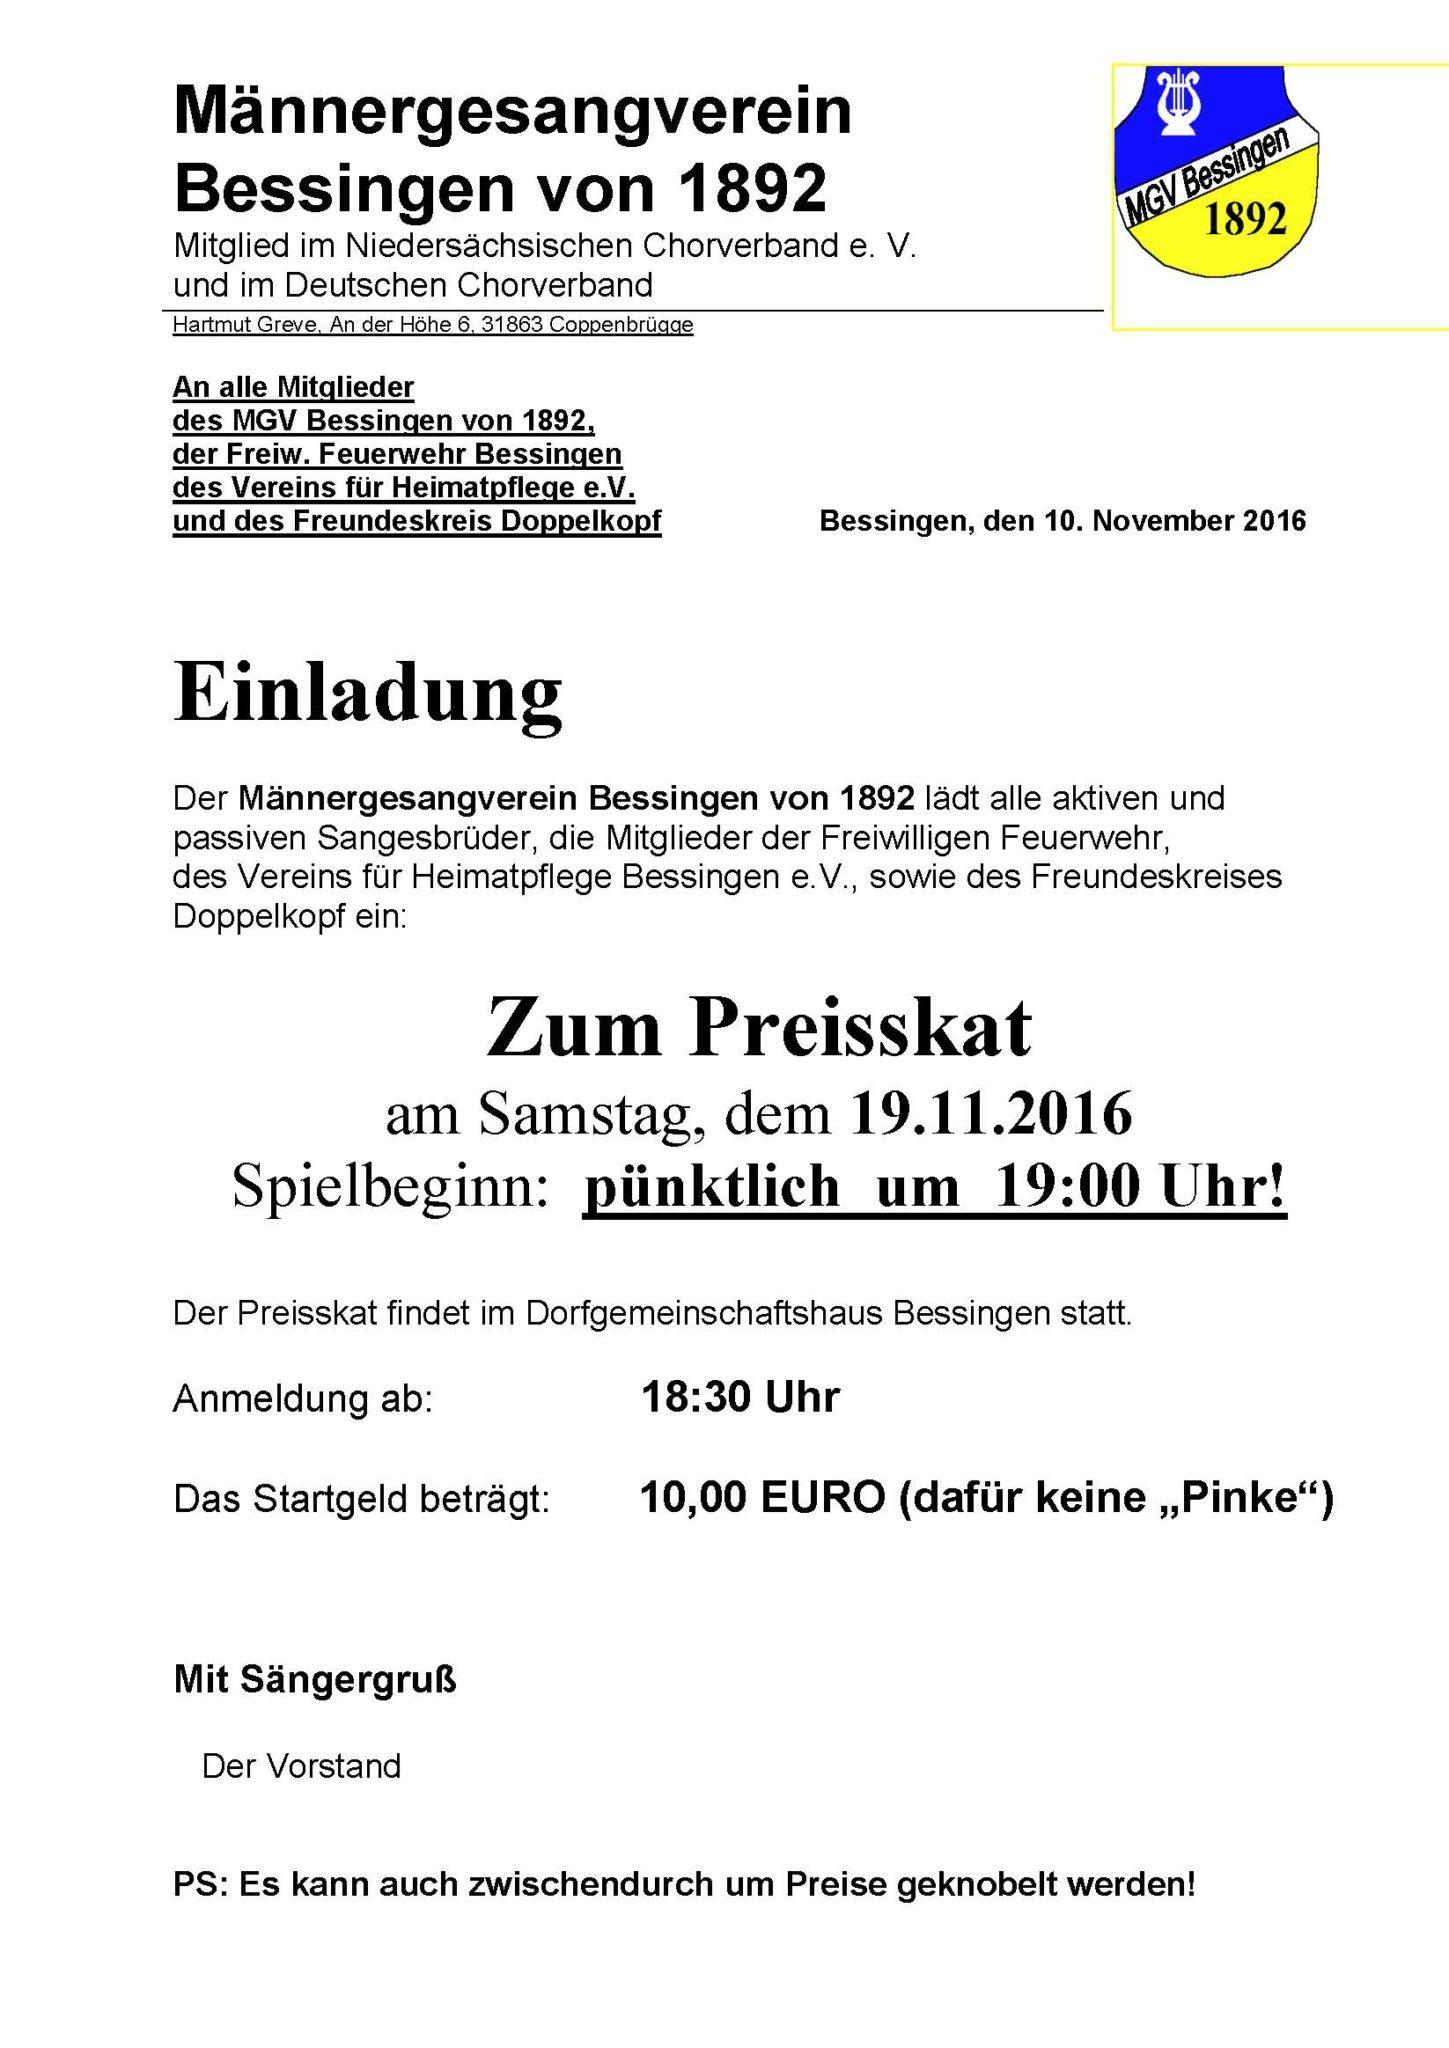 mgv_einladung_preisskat_2016